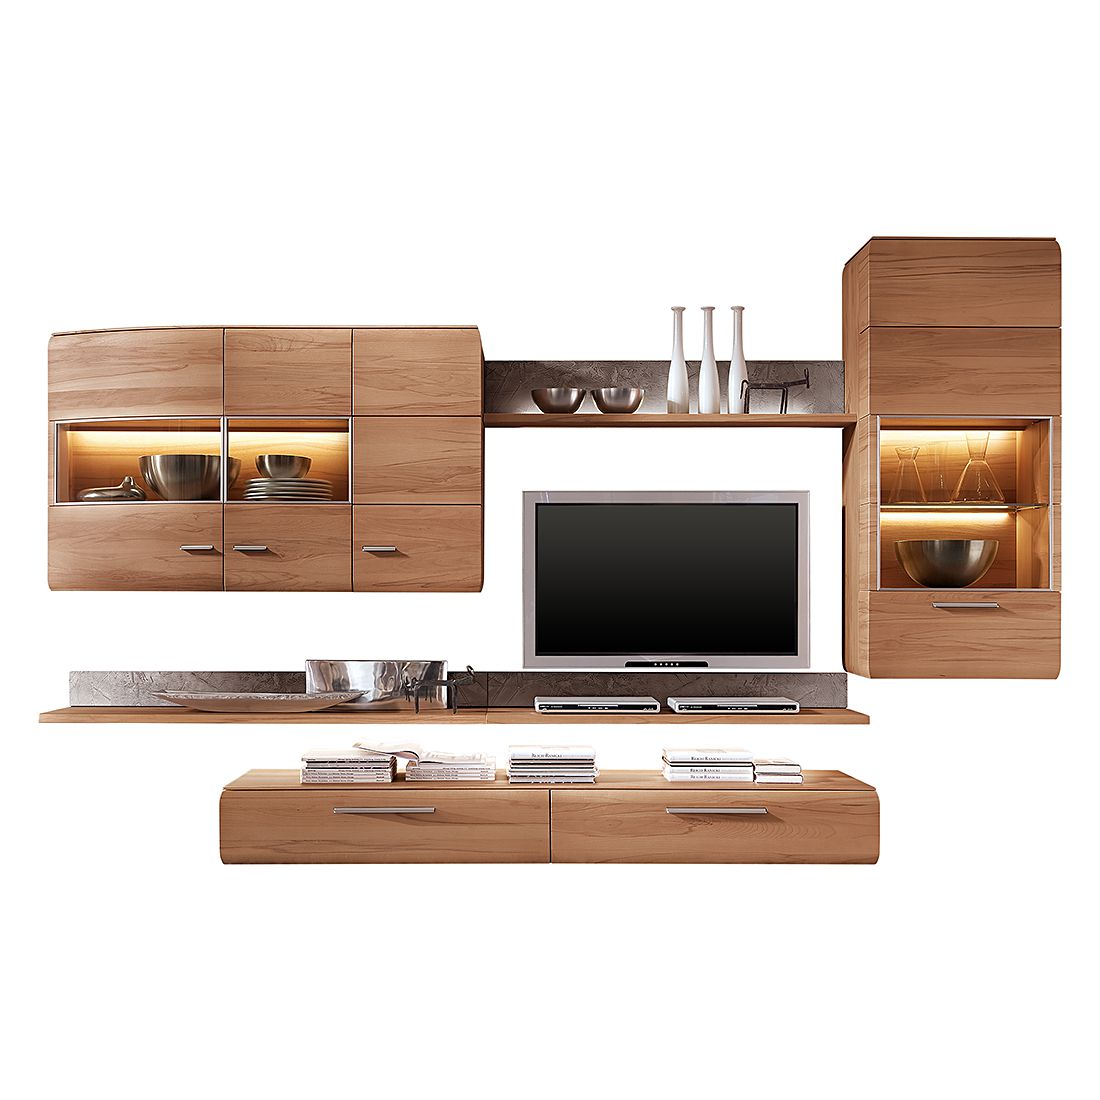 Gr e bht 35221355 farbe braun material massivholz style for Wohnwand 5 meter